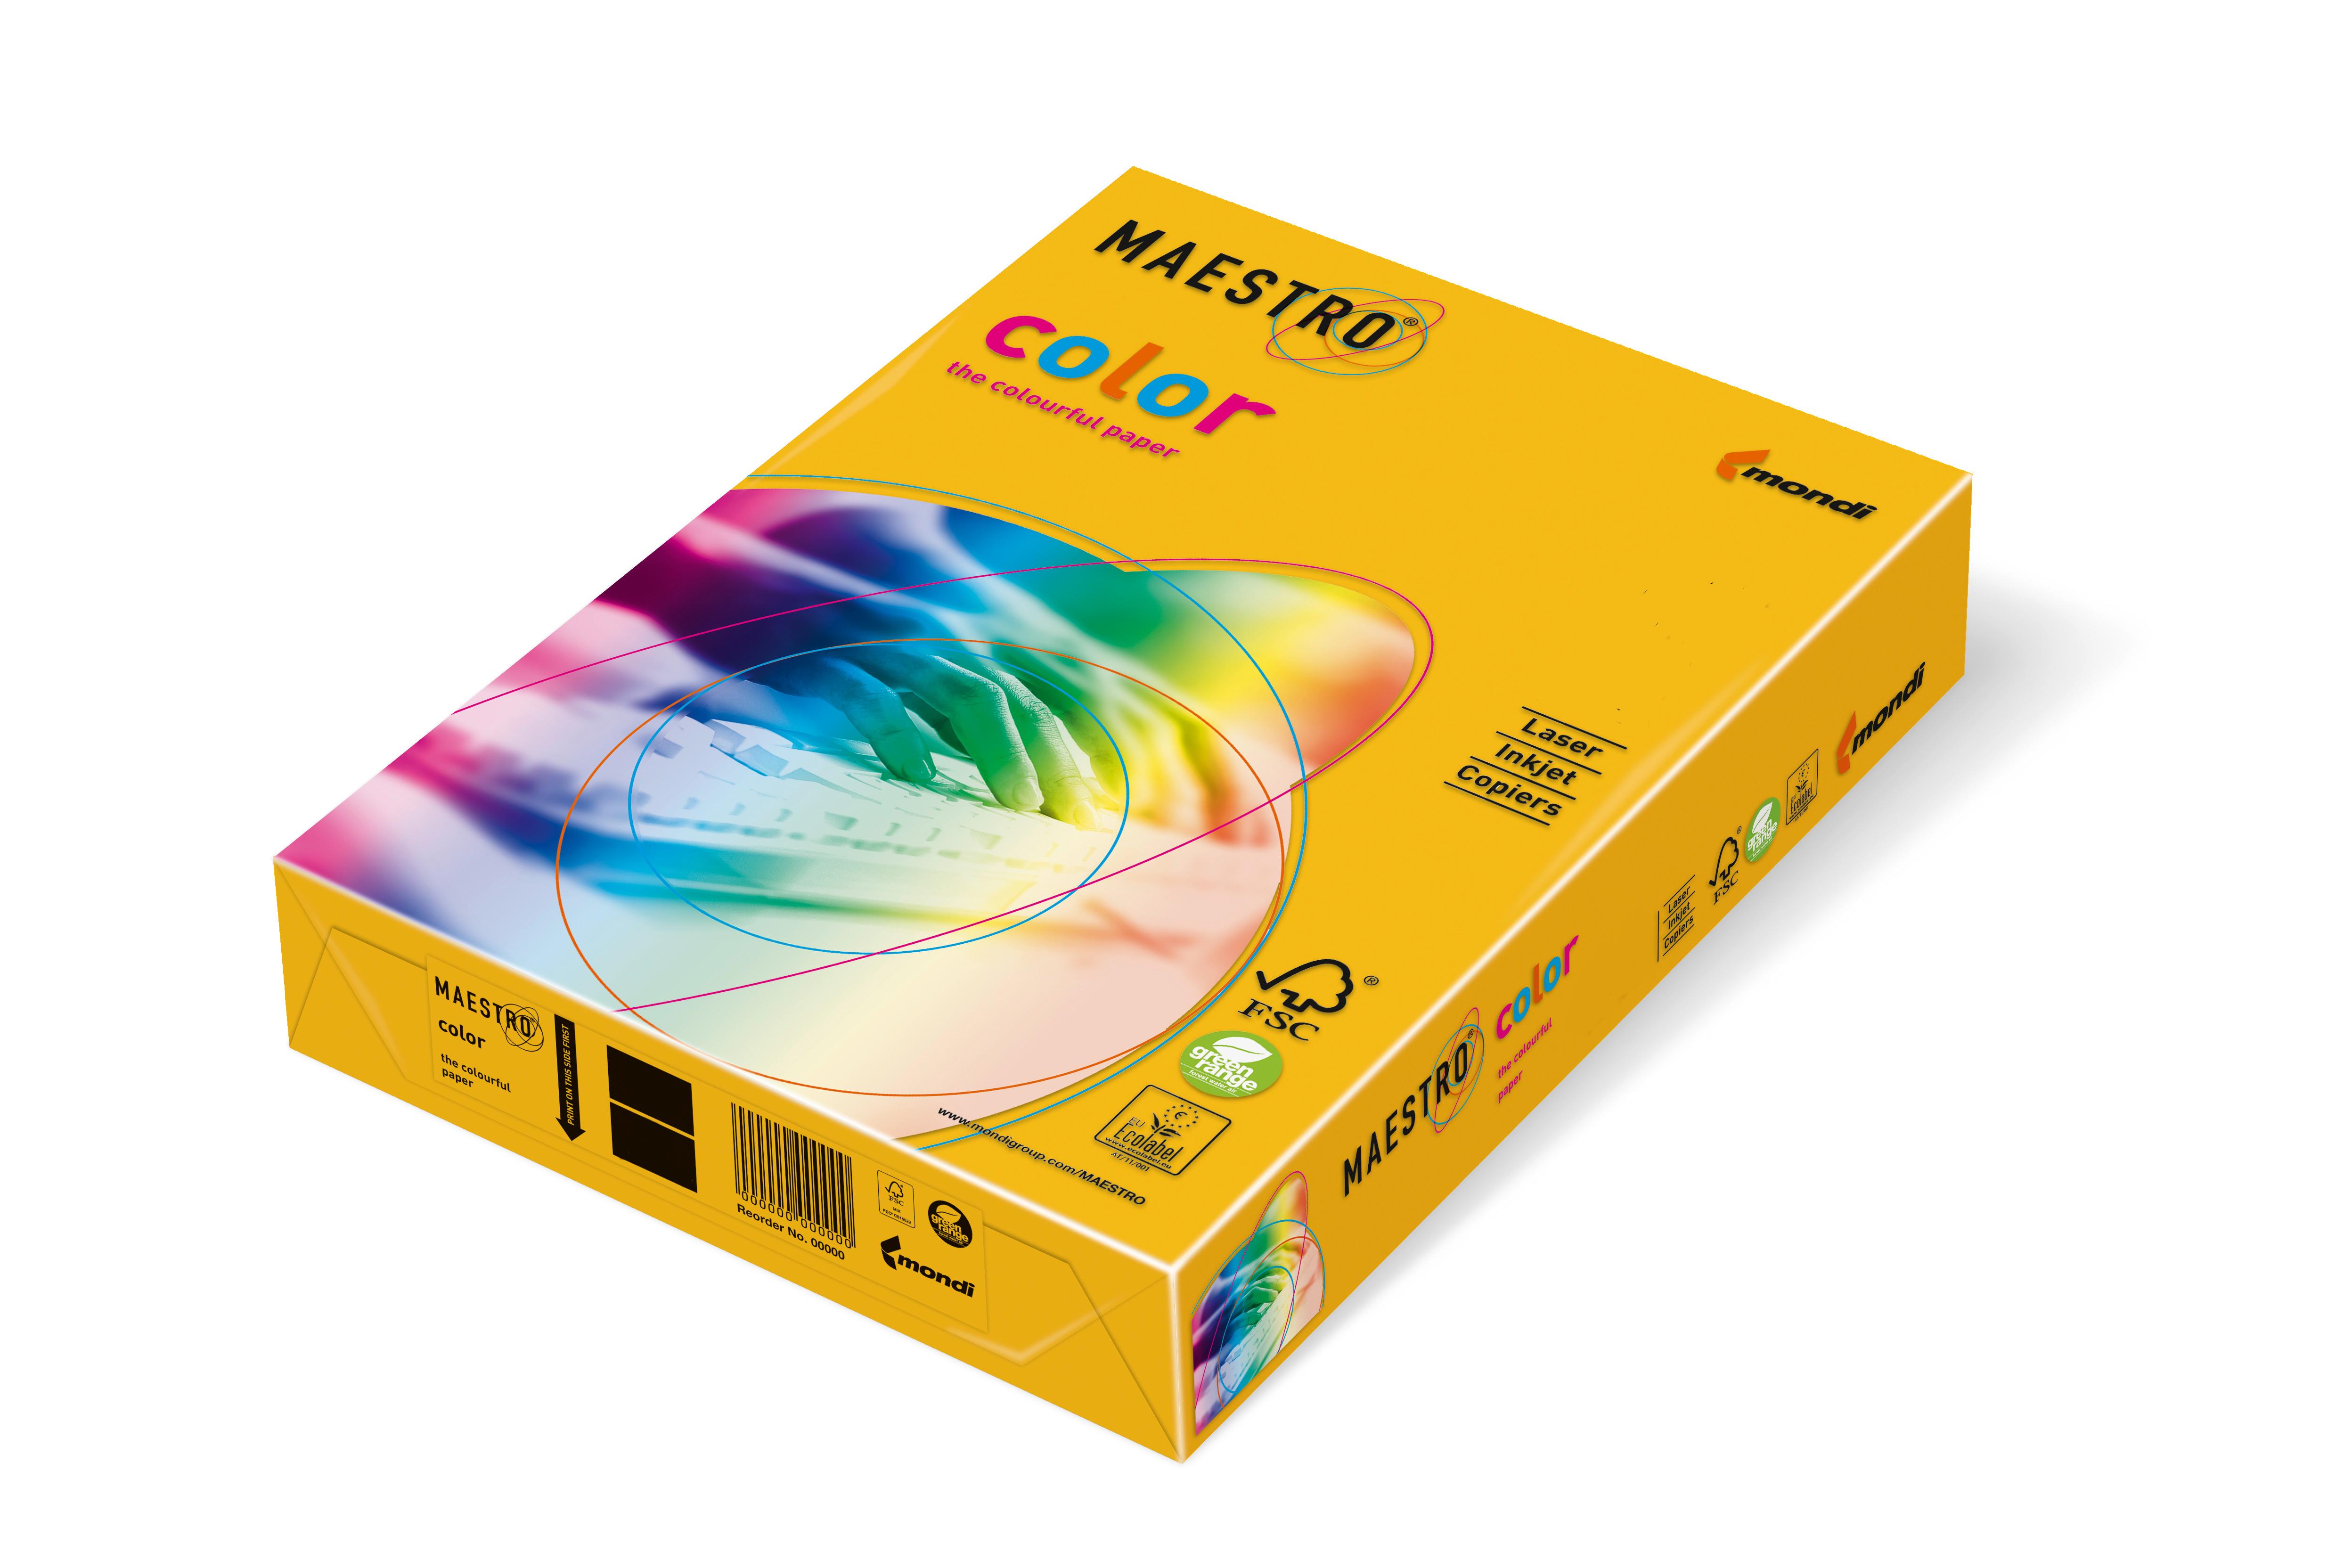 Vorschau: Mondi Maestro Color sonnengelb 80g/m² DIN-A4 - 500 Blatt SY40